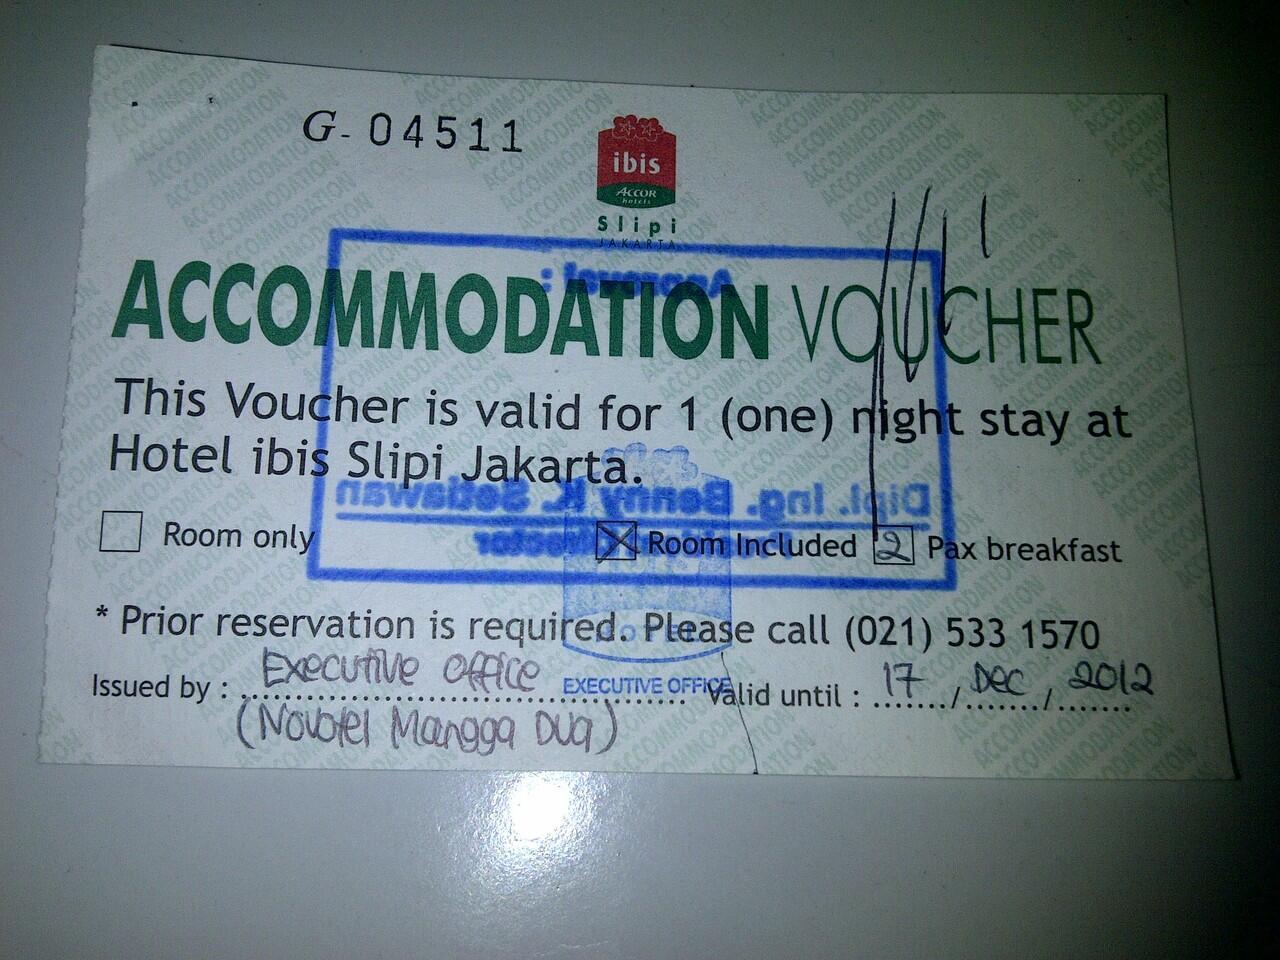 Jual Murah Voucher Hotel IBIS SLipi>> MUrah Bangettt ....GRAB IT FAST!!!!!!!